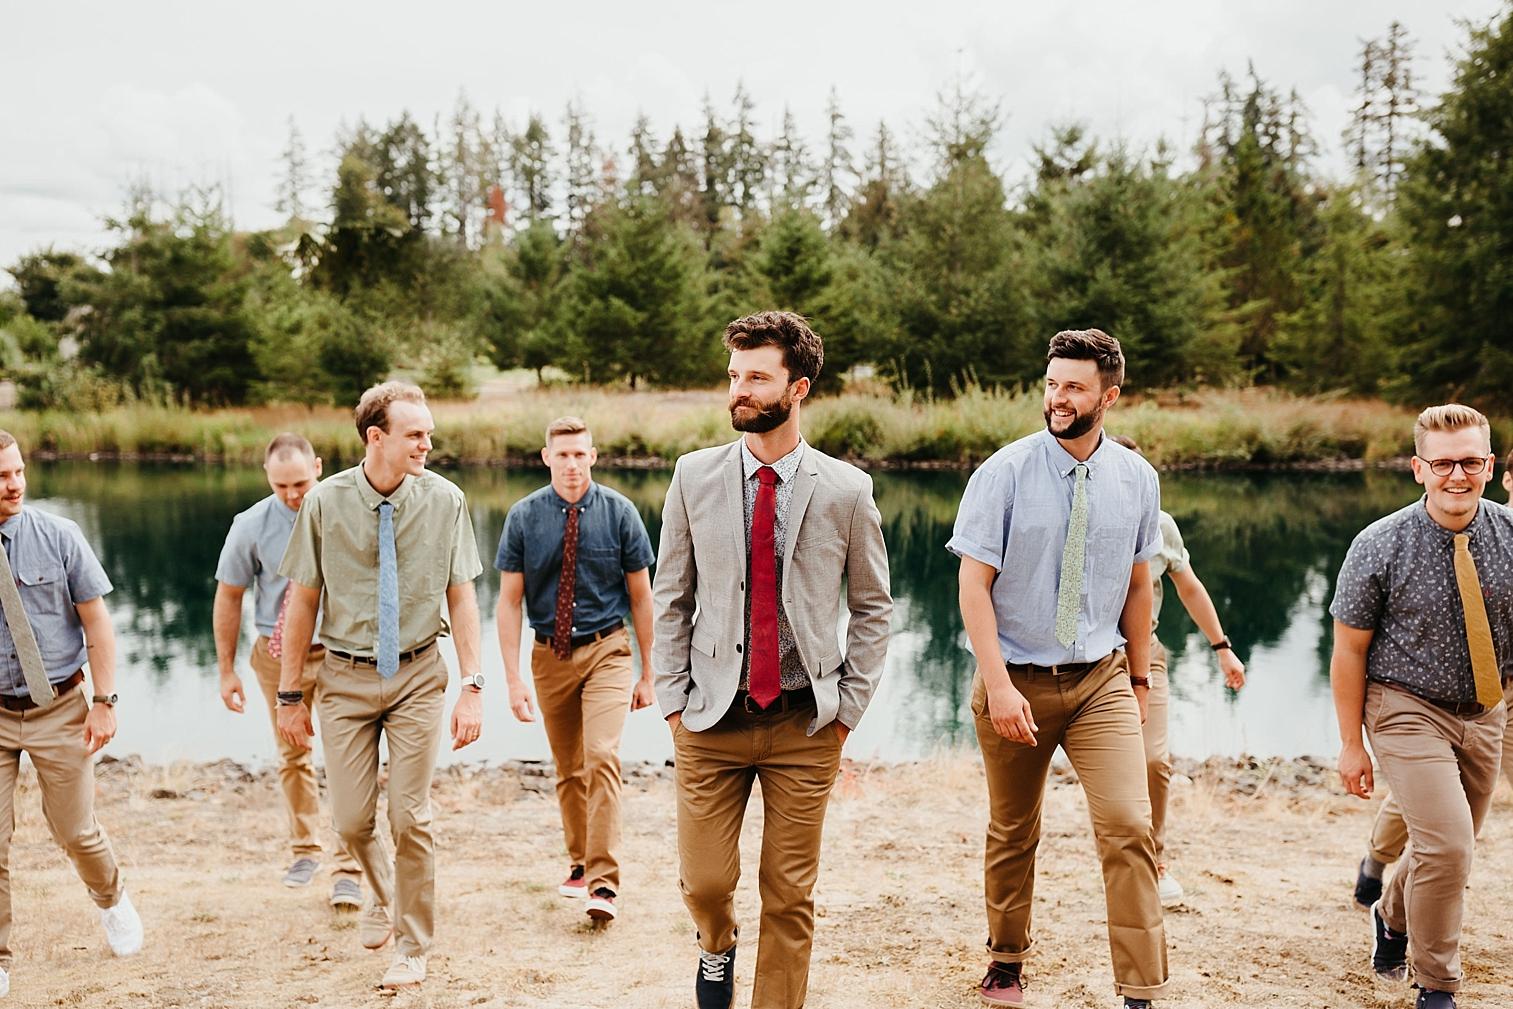 Summer-Camp-Themed-Wedding-50.jpg